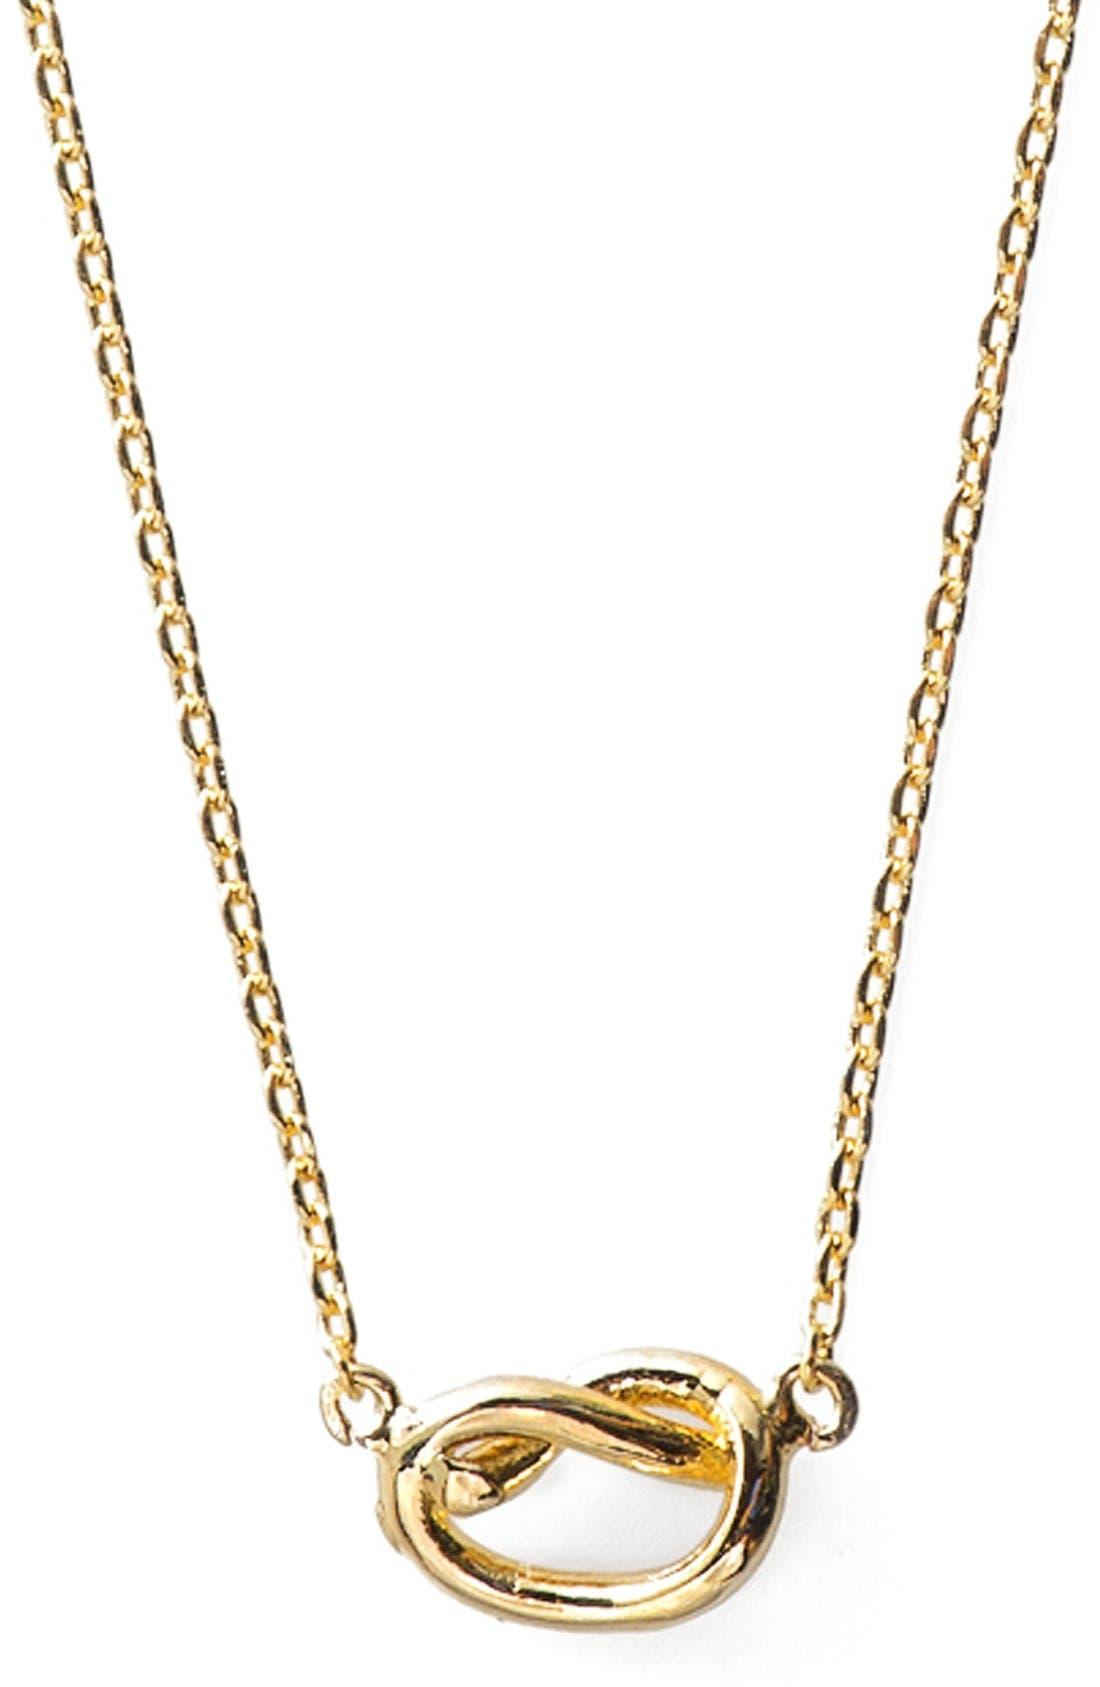 Main Image - Wanderlust + Co. Infinity Pendant Necklace